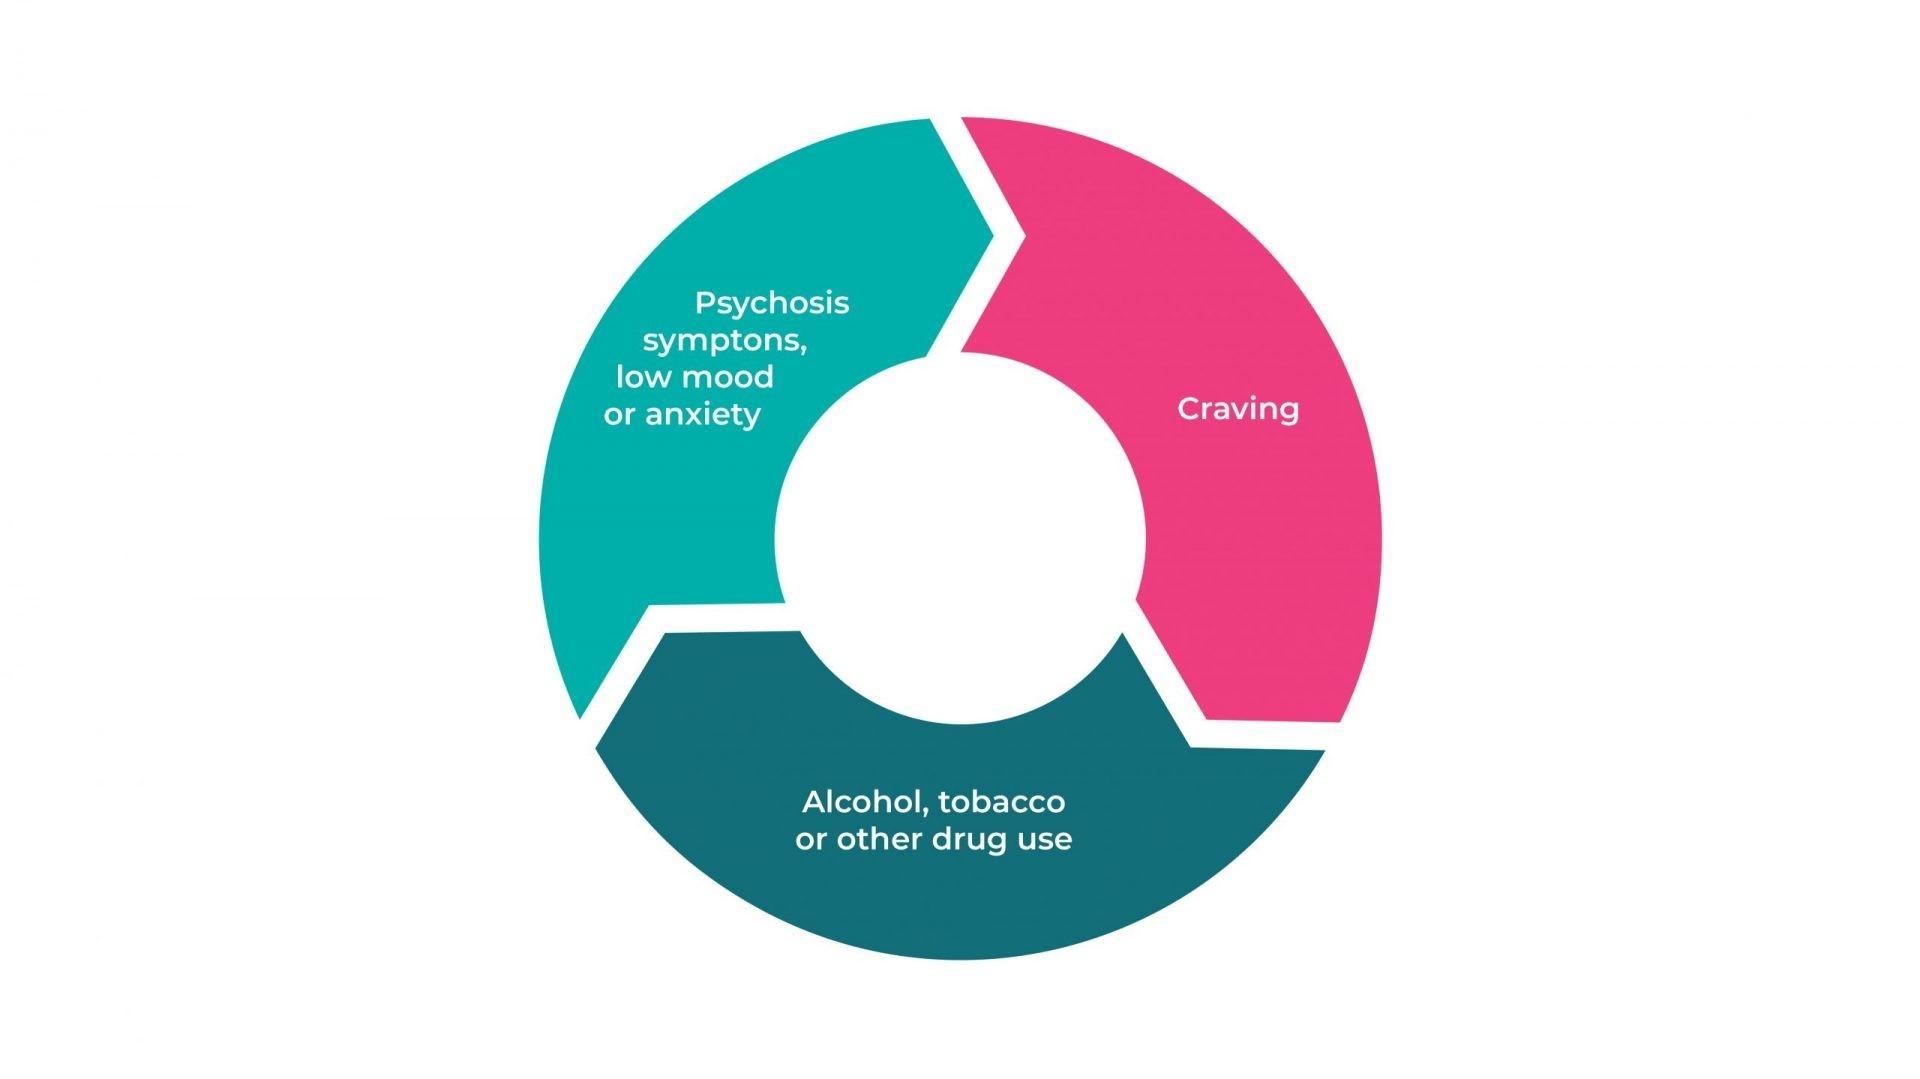 Cycle of psychosis symptoms, cravings, and drug use